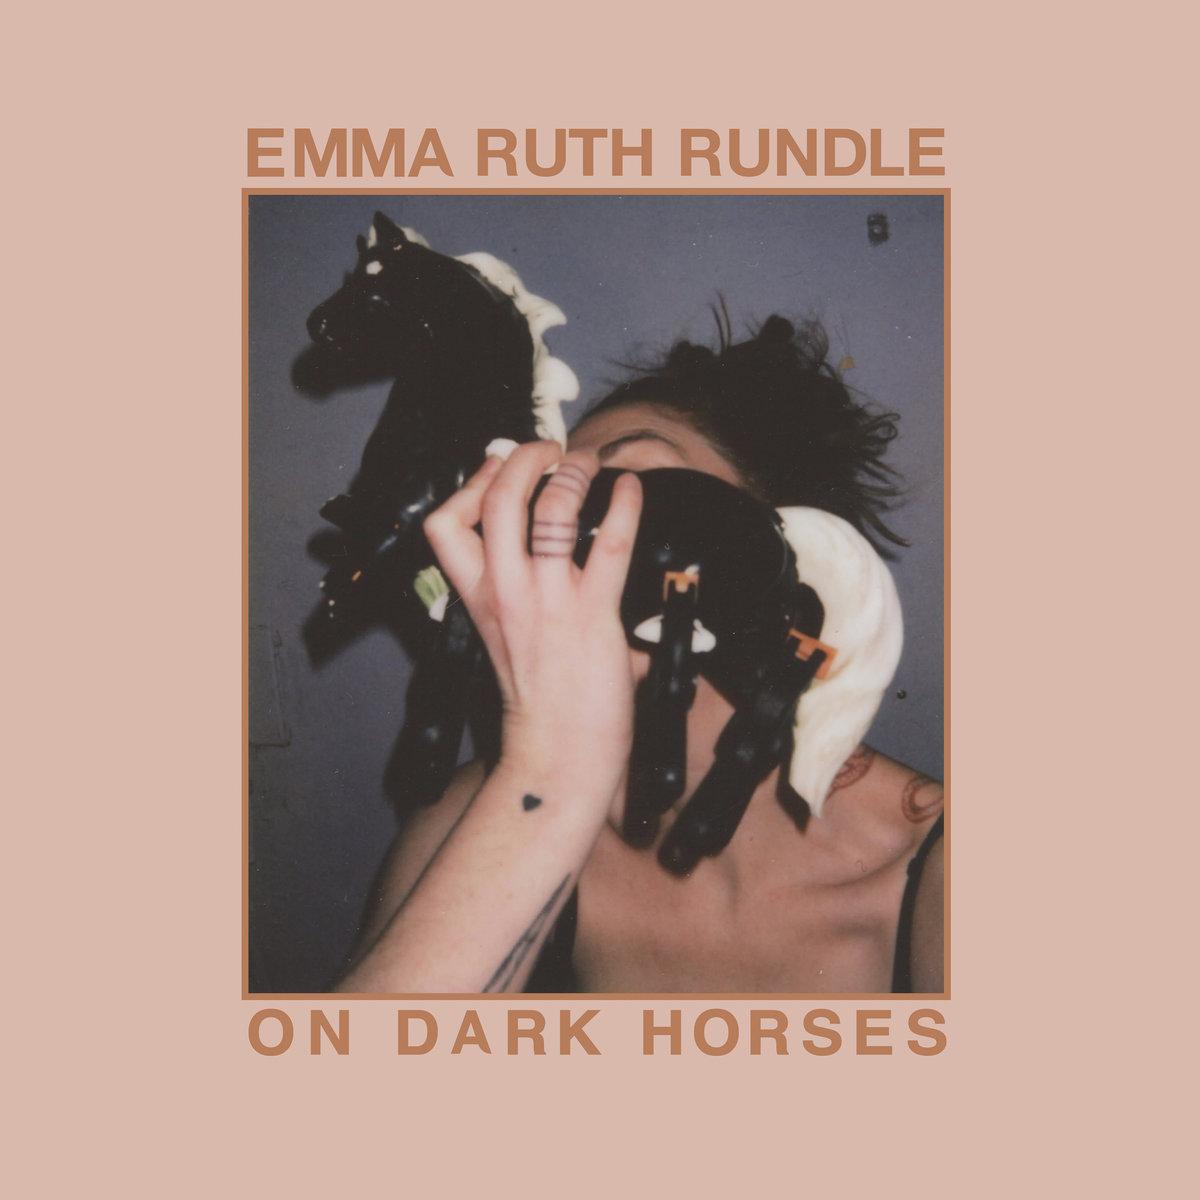 Emma Ruth Rundle - On Dark Horses LP